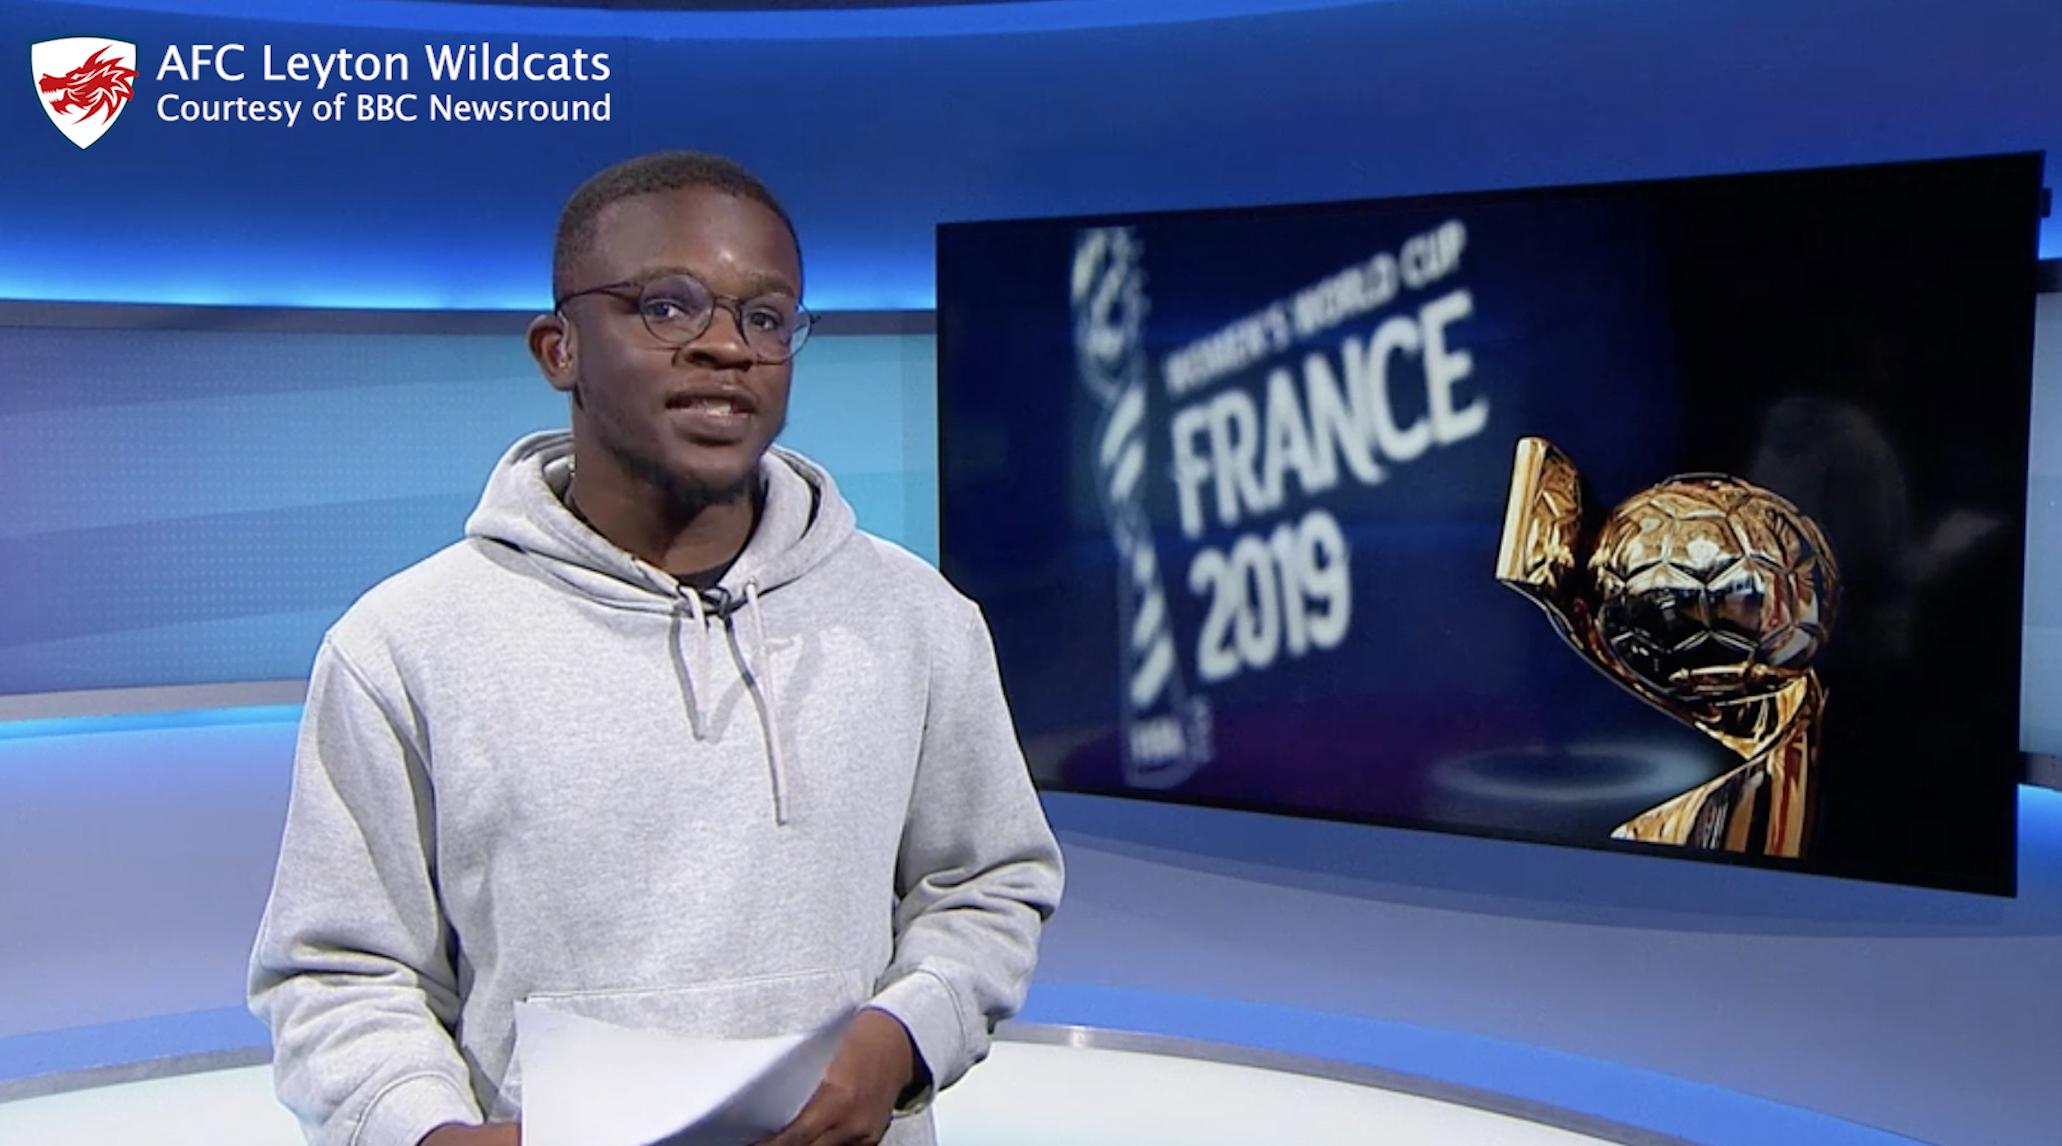 AFC Leyton Wildcats on BBC Newsround